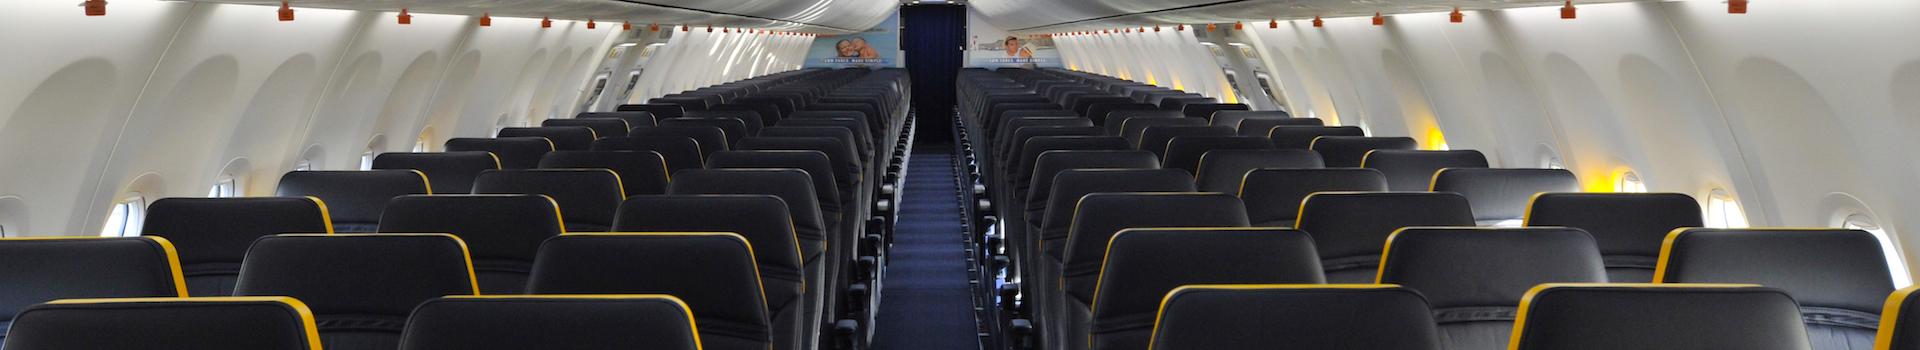 Ryanair Corporate